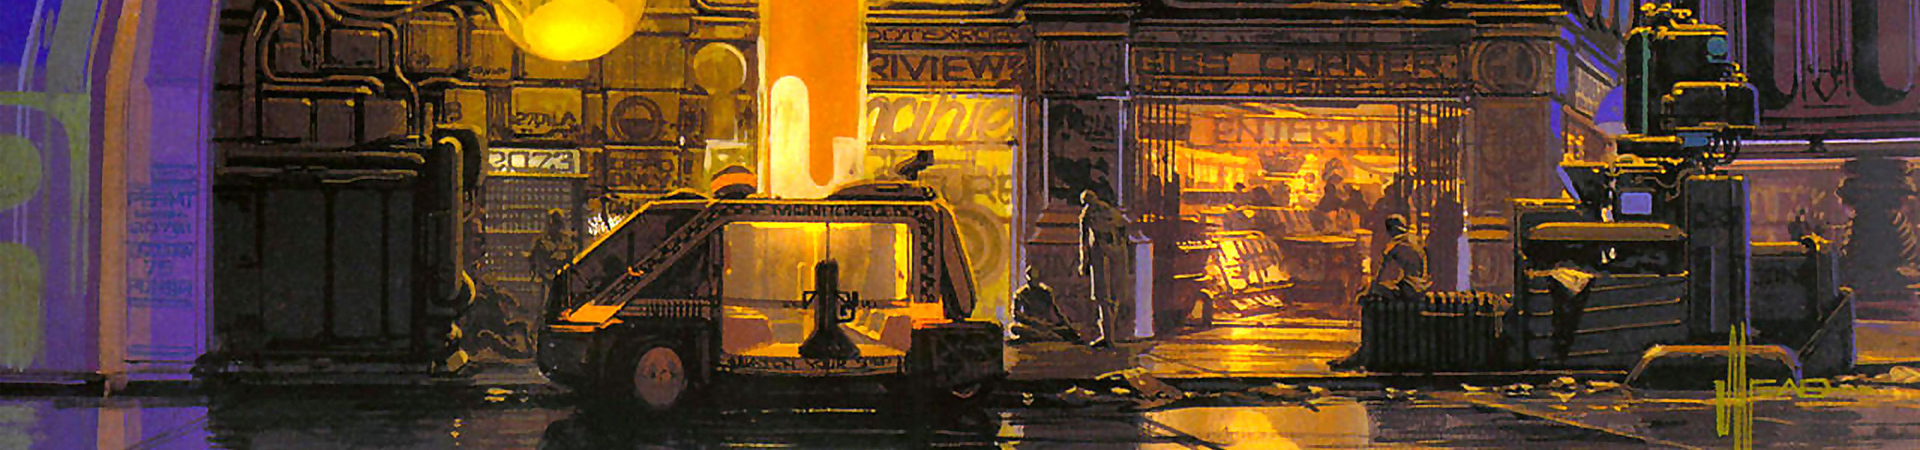 Syd Mead desings for Blade Runner-2